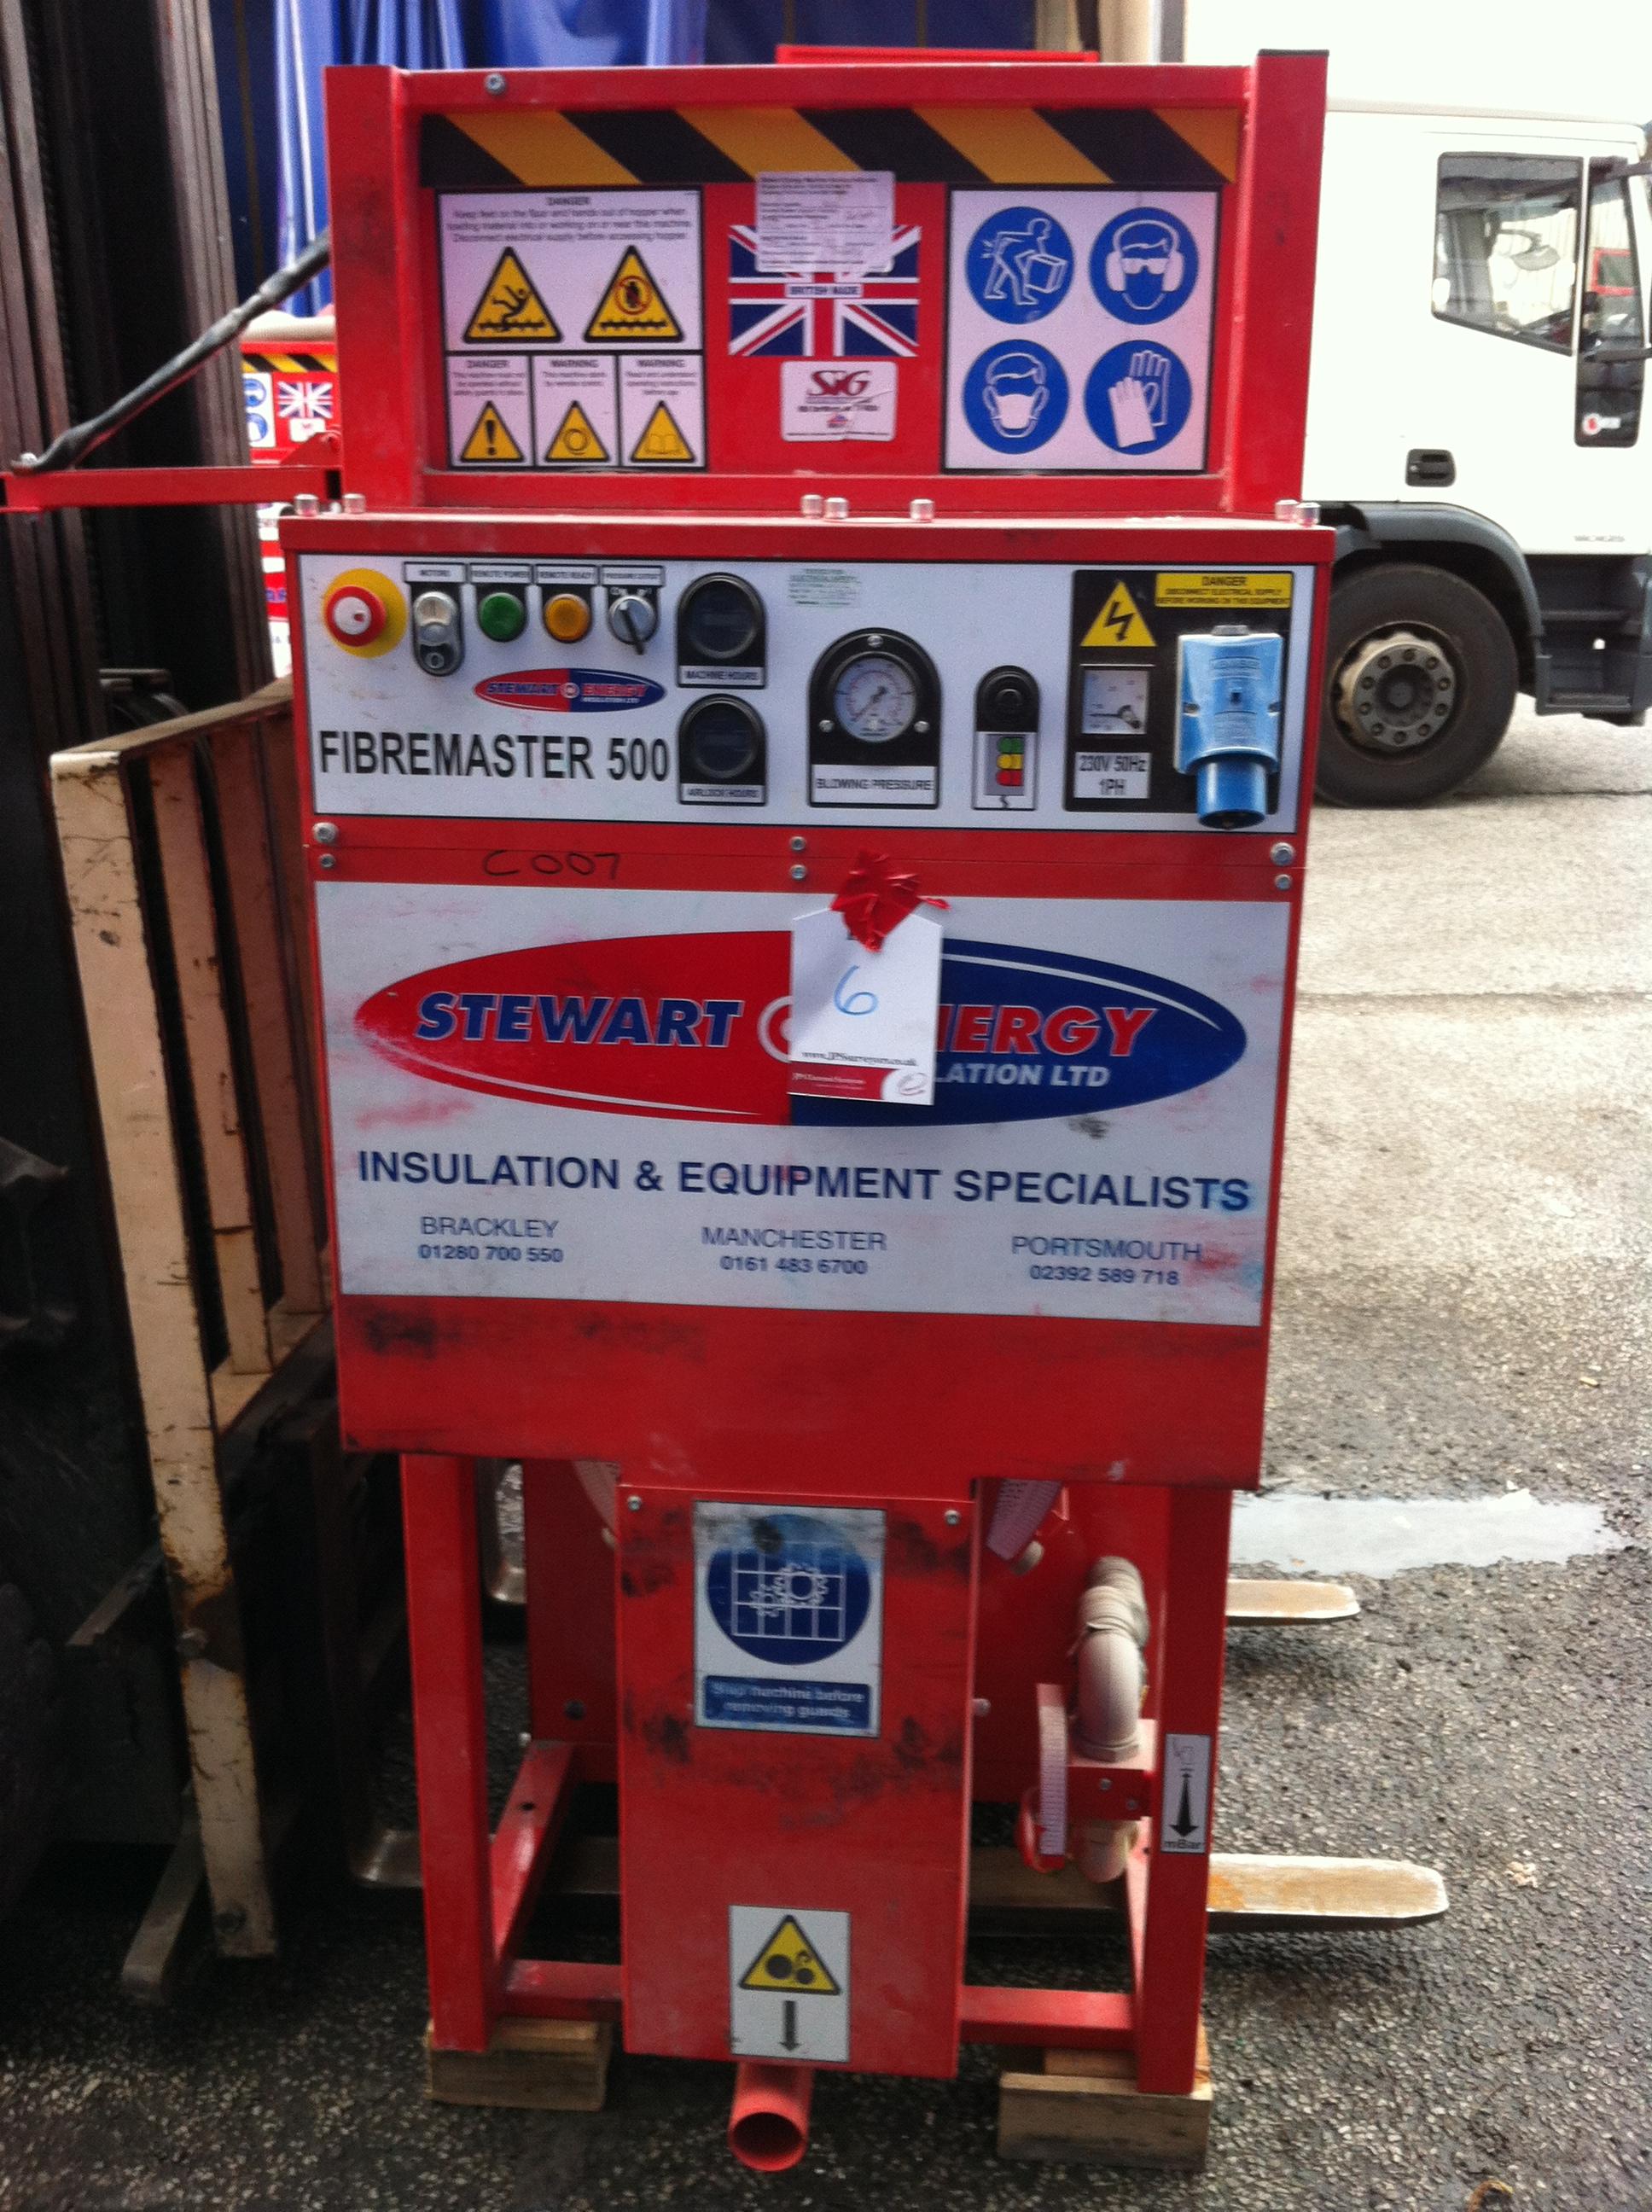 Stuart Energy Cavity Wall Insulation Machine - FibreMaster 500